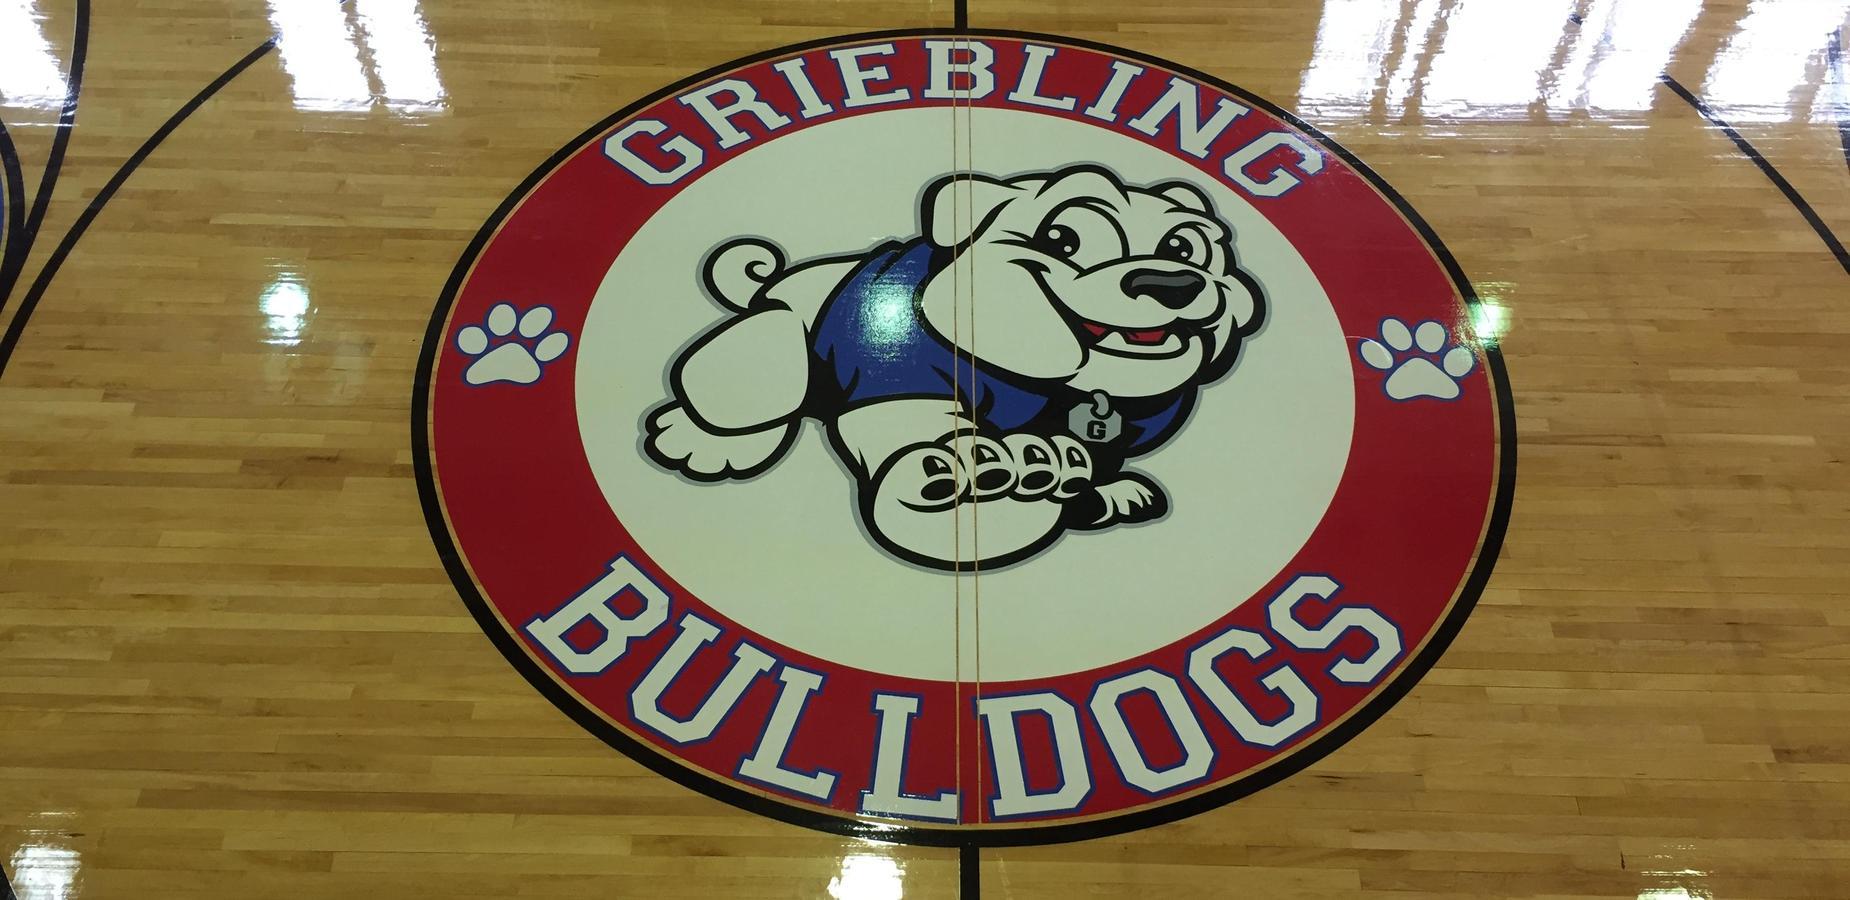 Griebling Bulldogs